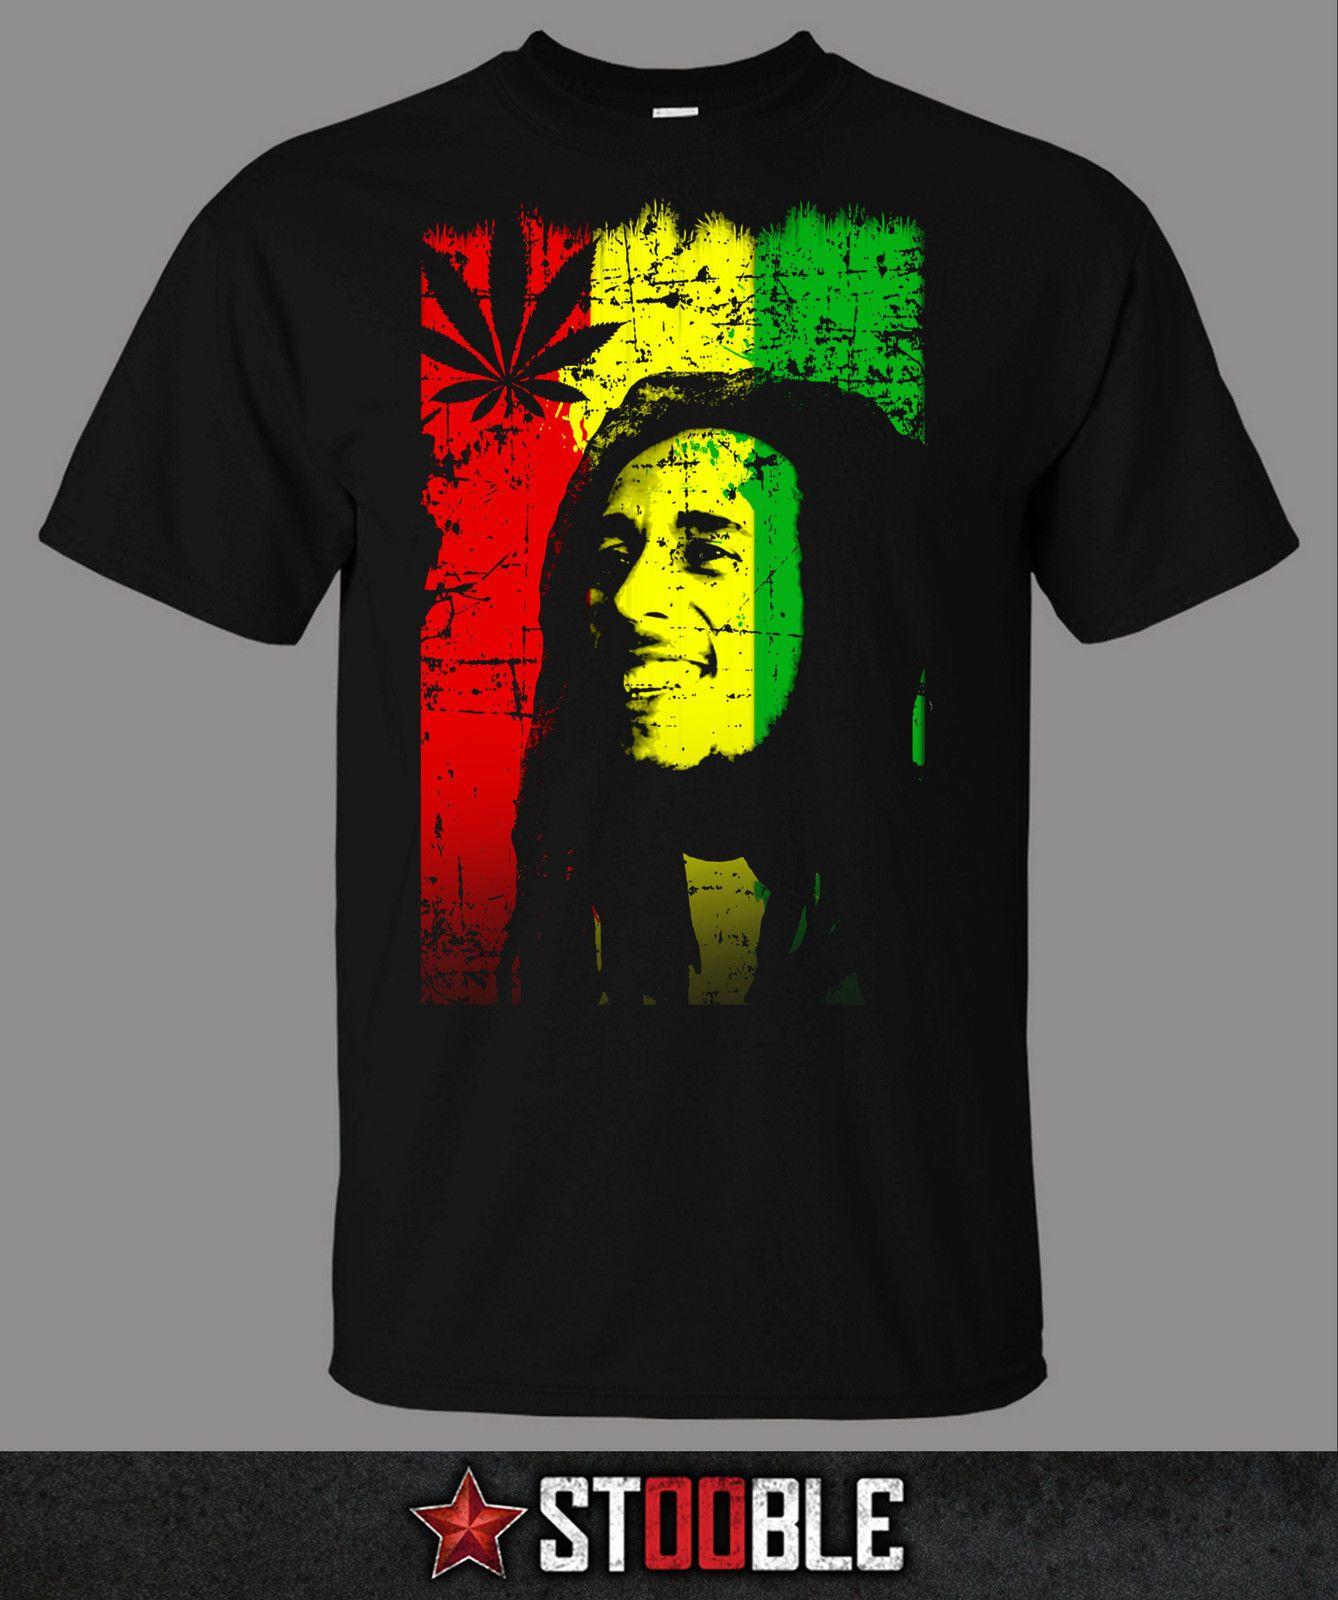 493a0592506 Bob Marley T Shirt New Ts Shirts A Team Shirts From Nothingshirt ...